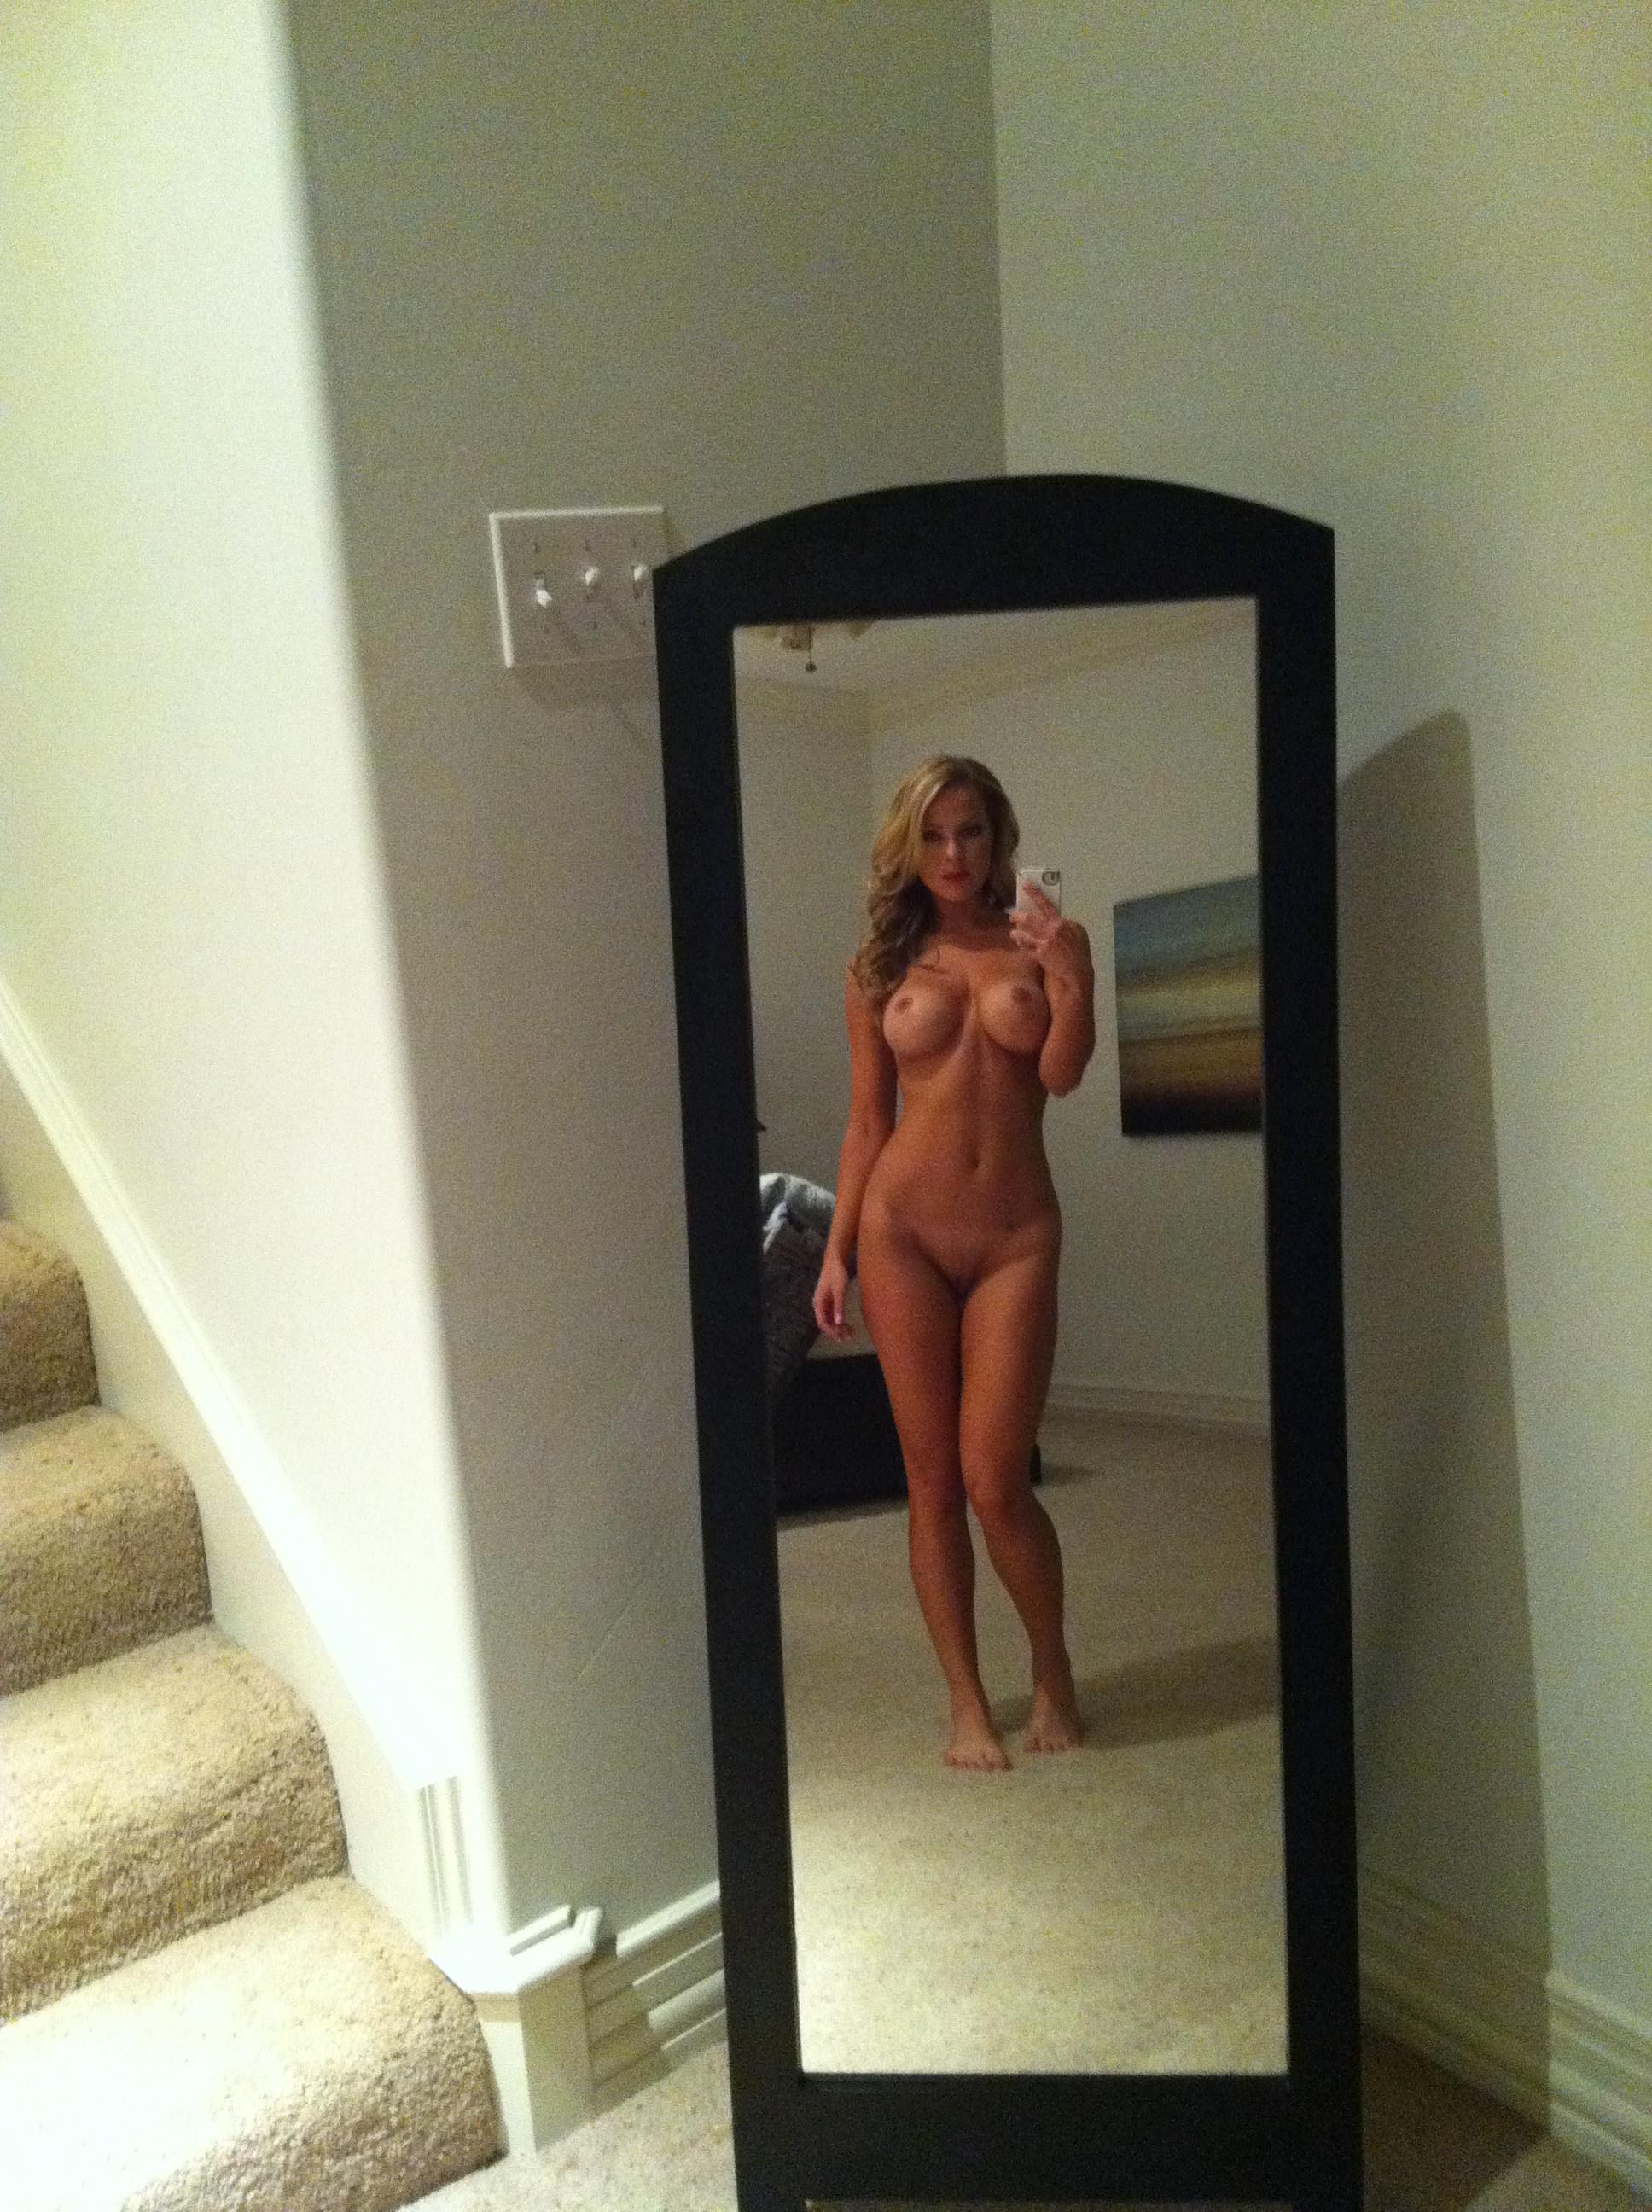 Shannon tweed naked - 155 Pics - xHamstercom